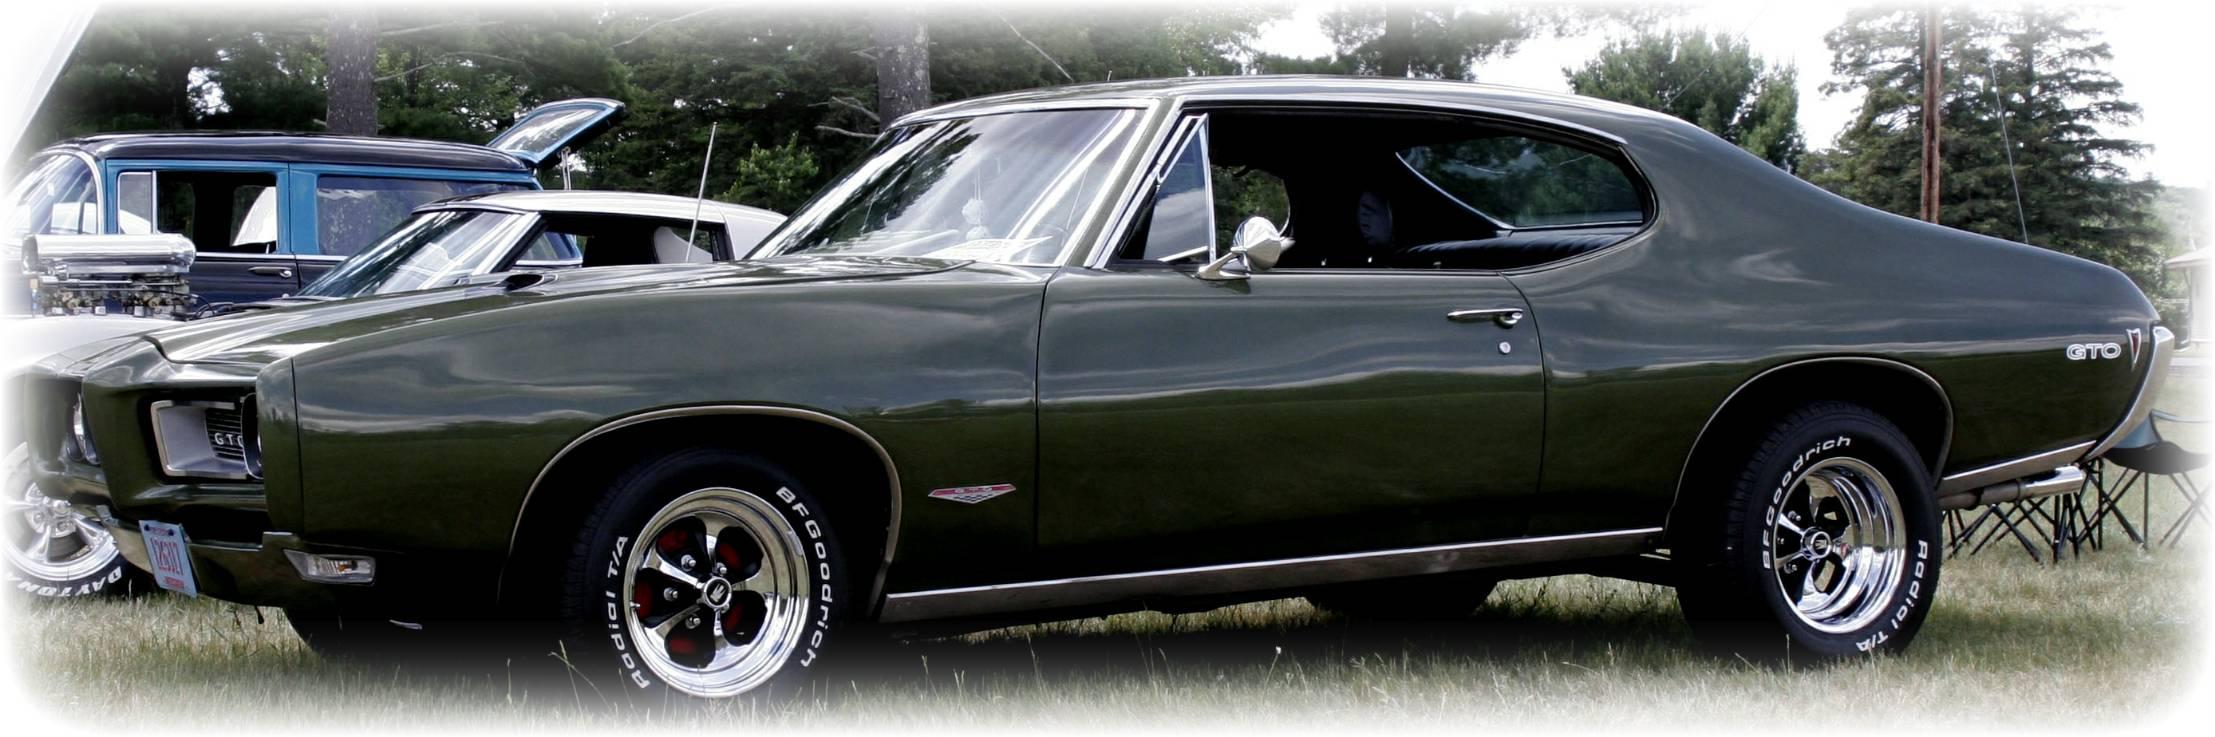 1967 Camaro ss/rs 350